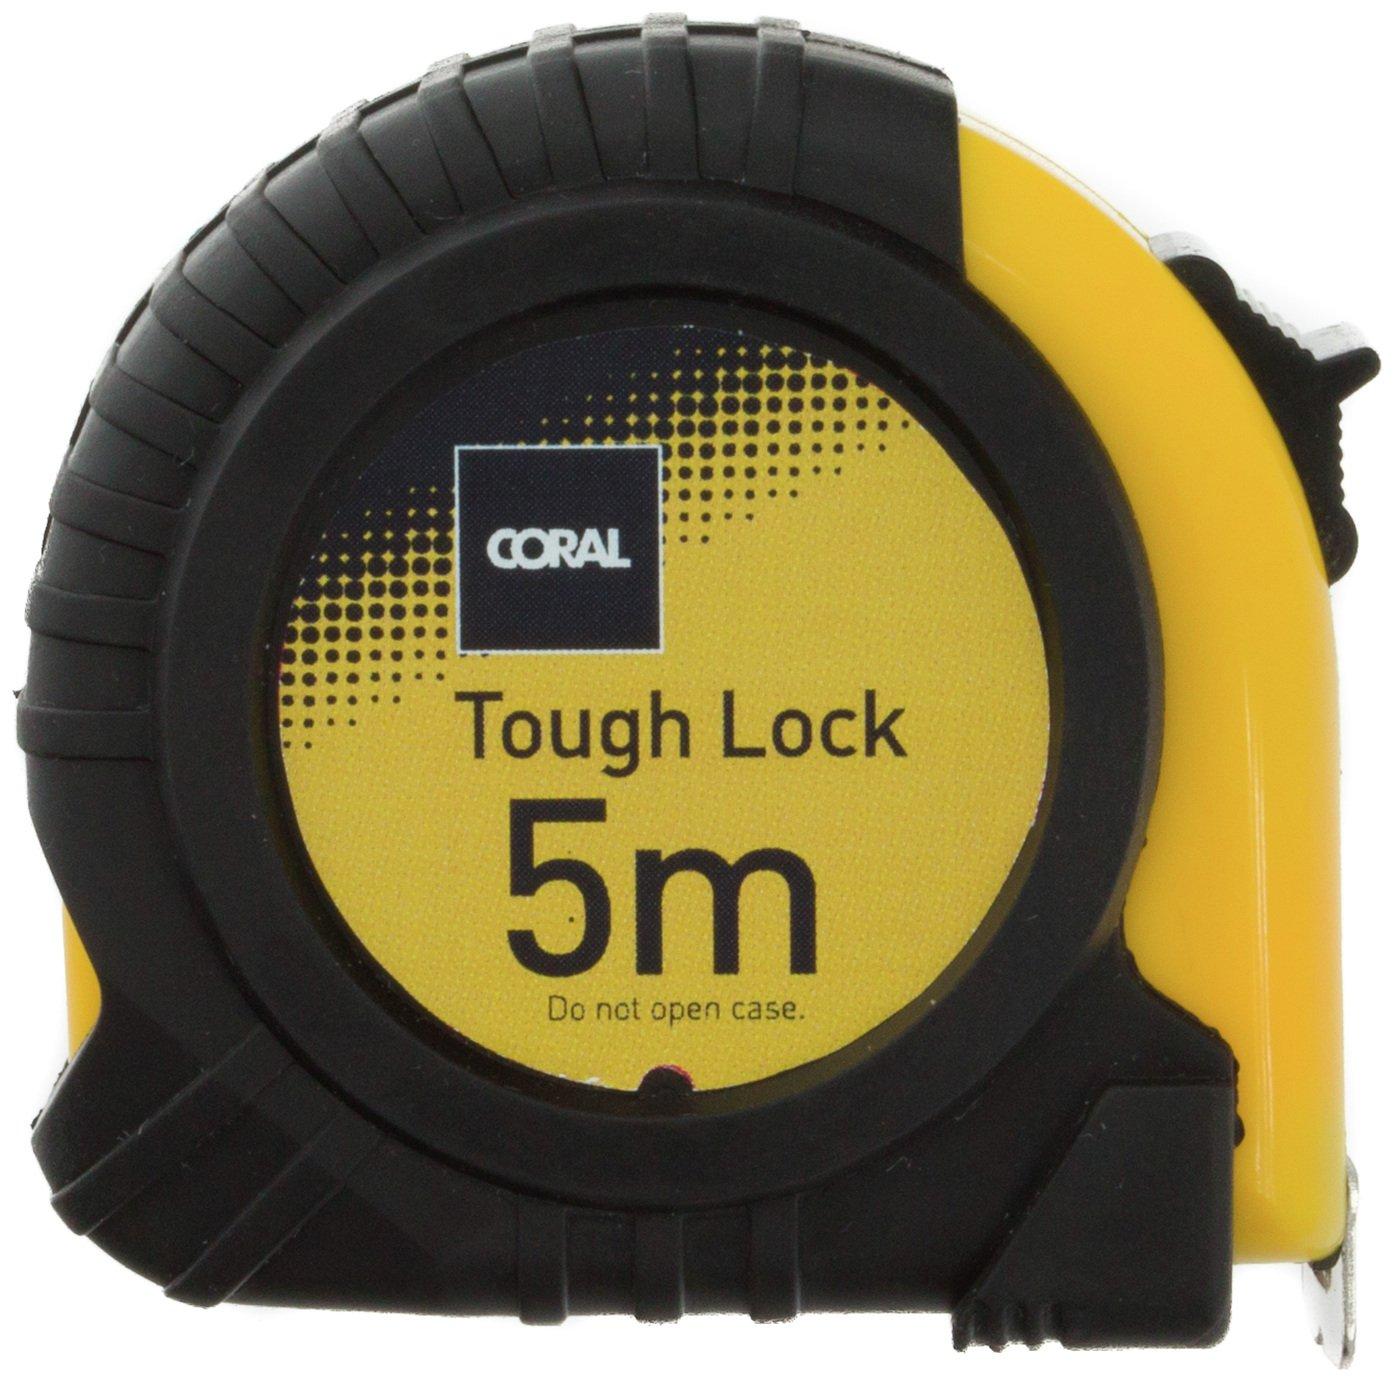 Coral - Tough Lock Pocket Tape Measure - 5 Metre Review thumbnail